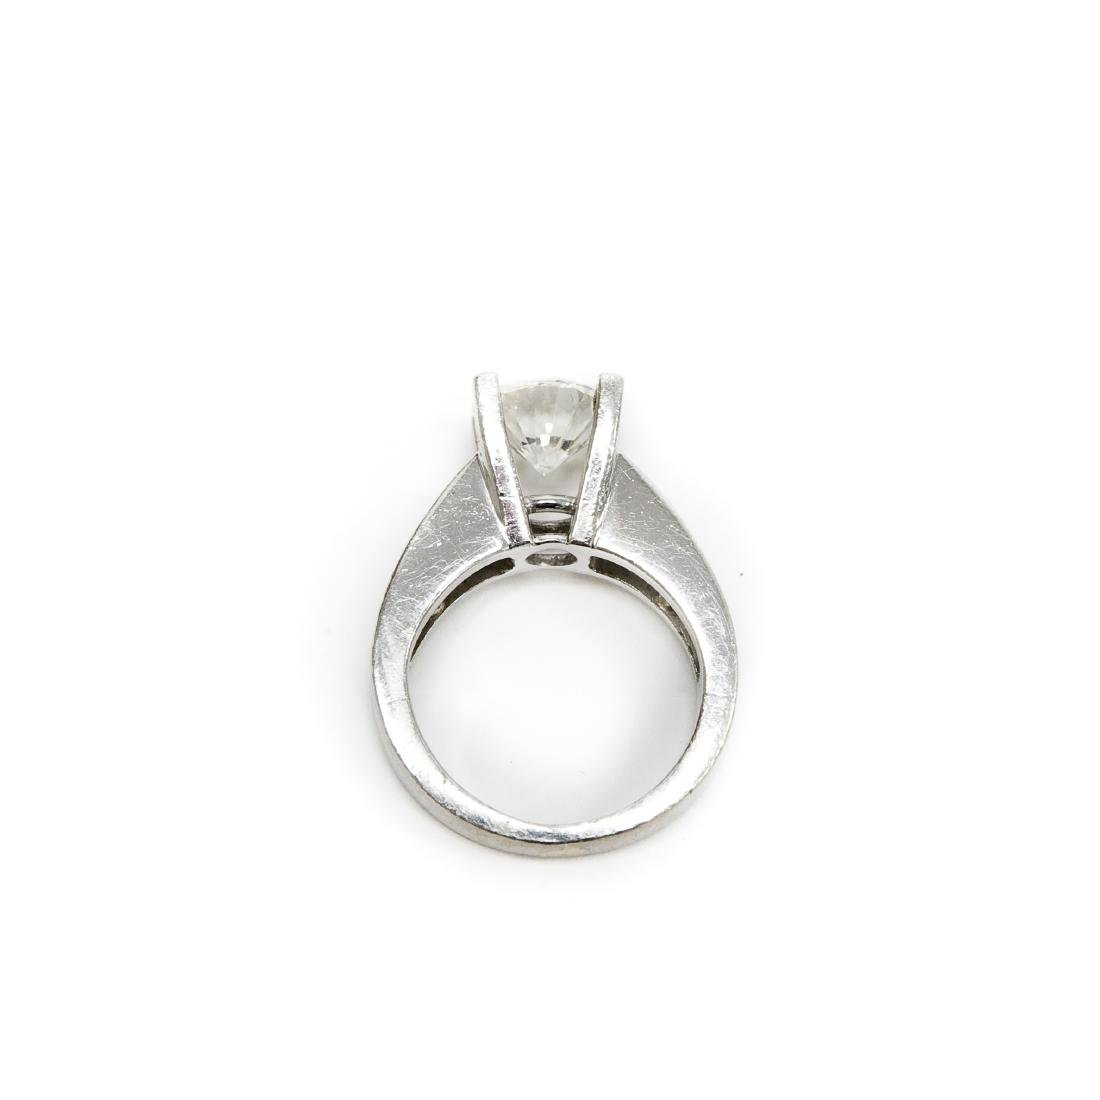 18K White Gold & Diamond Ring. 2.17 ct Center Diamond. - 2